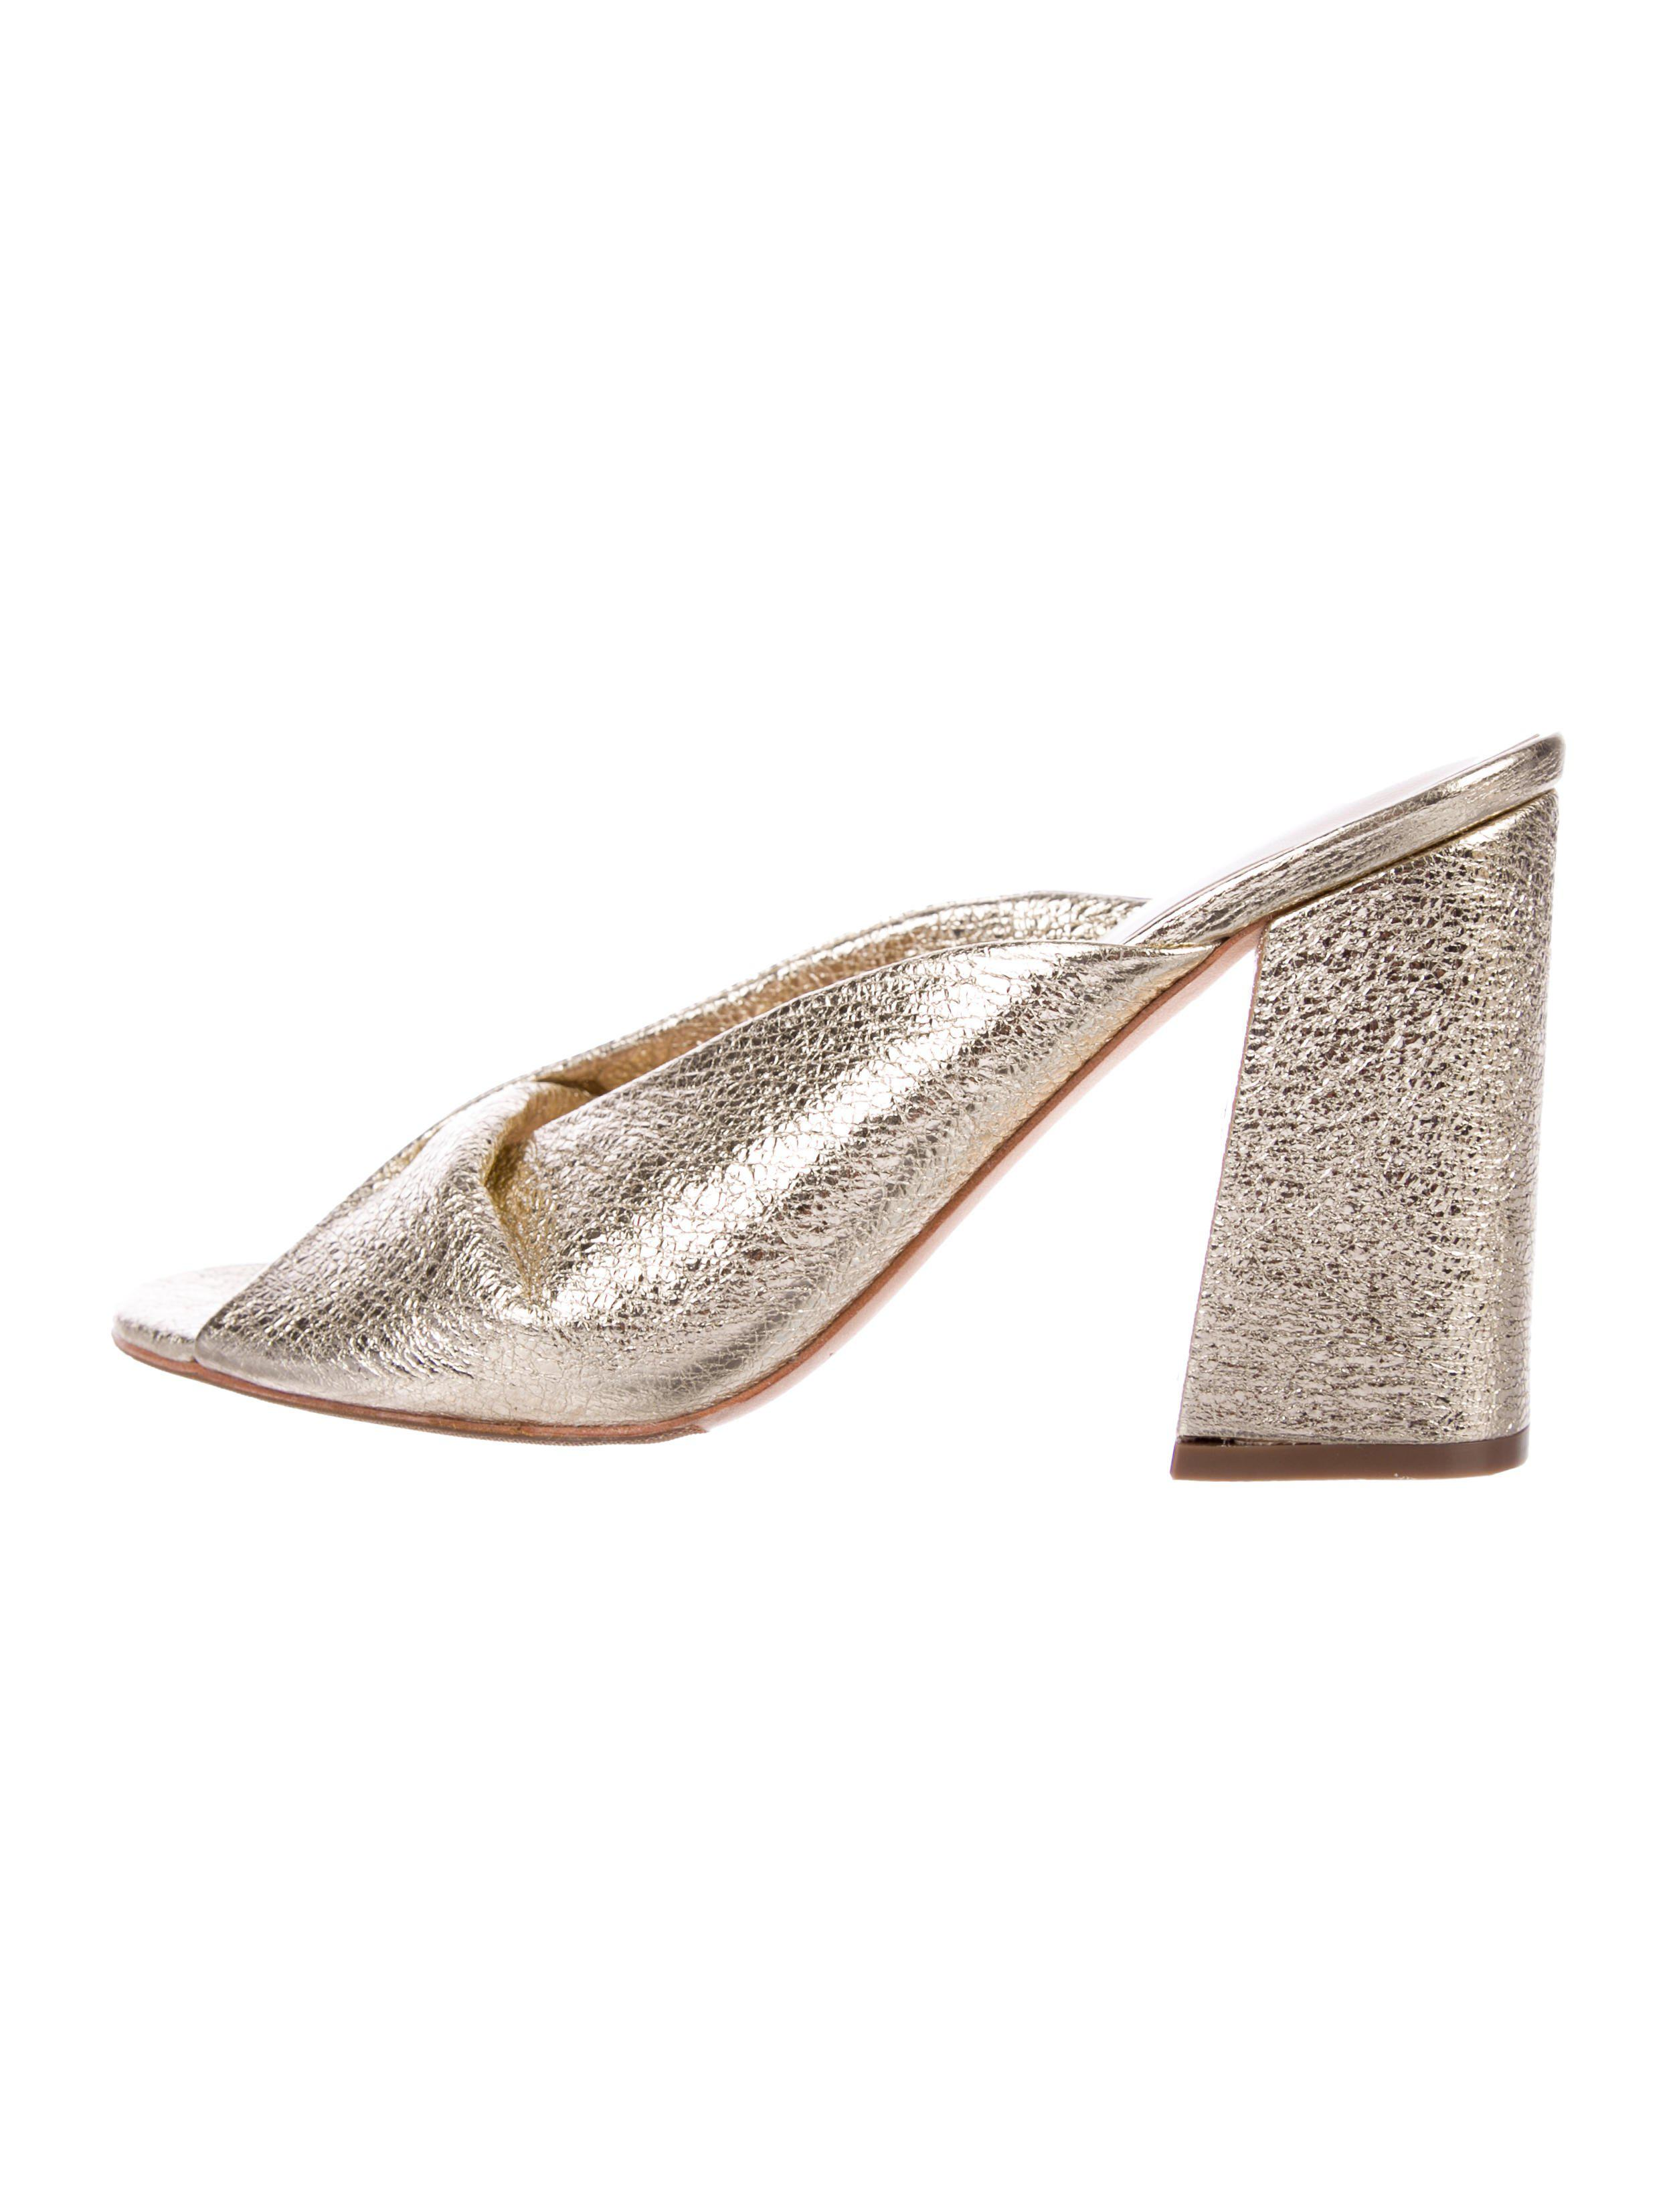 b1526a49866b Lyst - Loeffler Randall Slide Sandals in Metallic